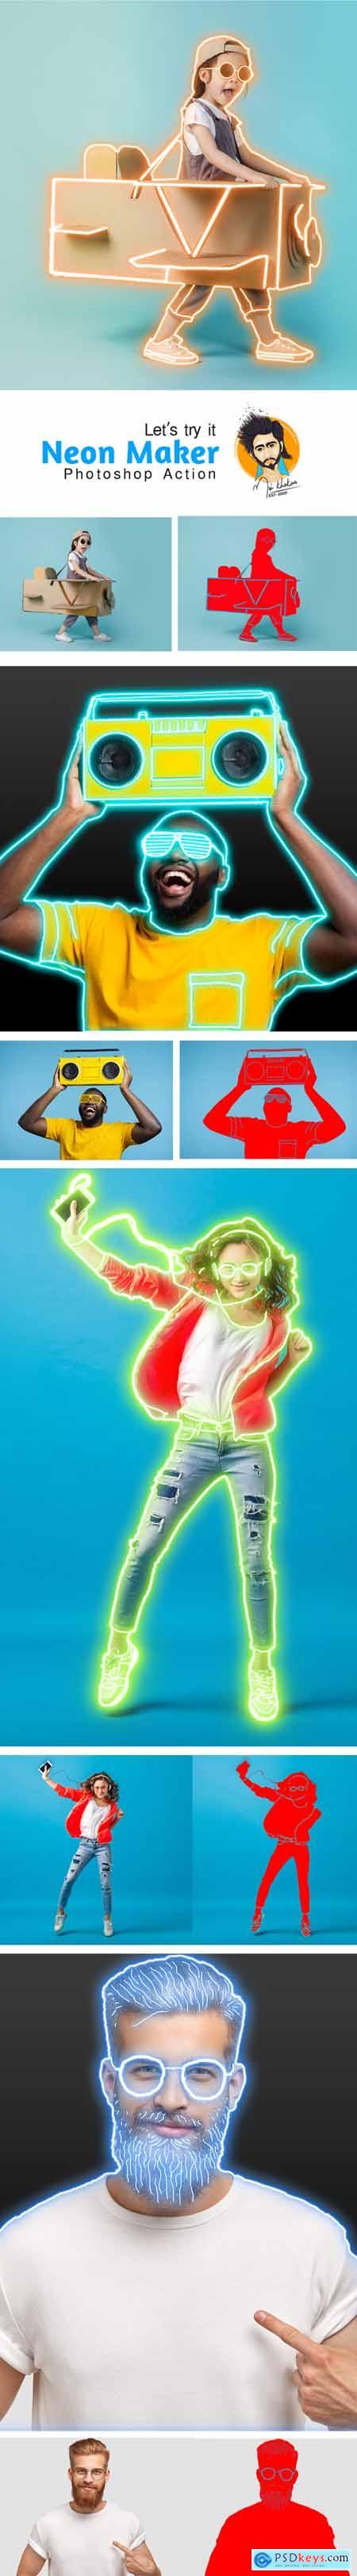 Neon Maker Photoshop Action 29732242